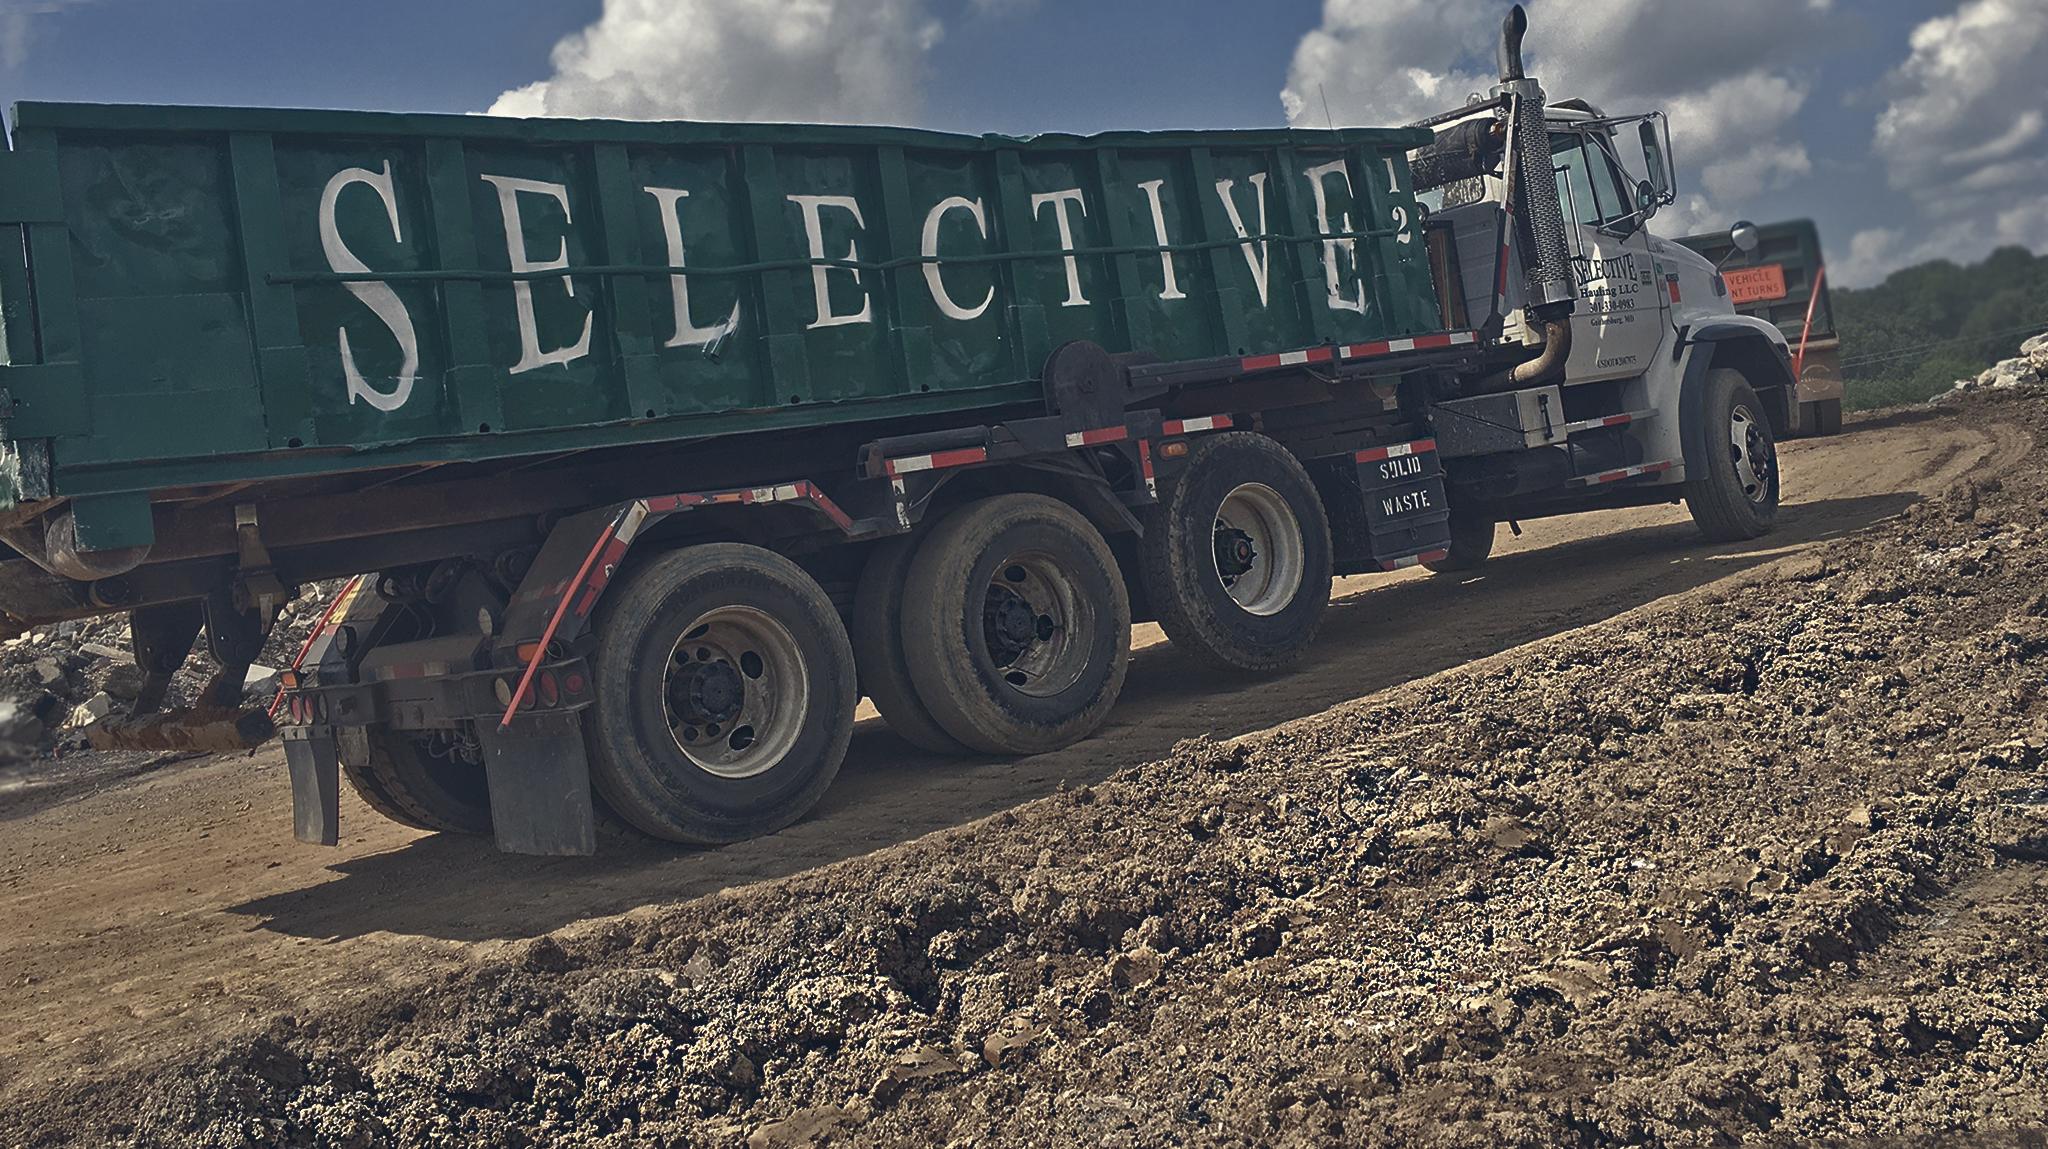 Dirt dumpster rental Bethesda MD